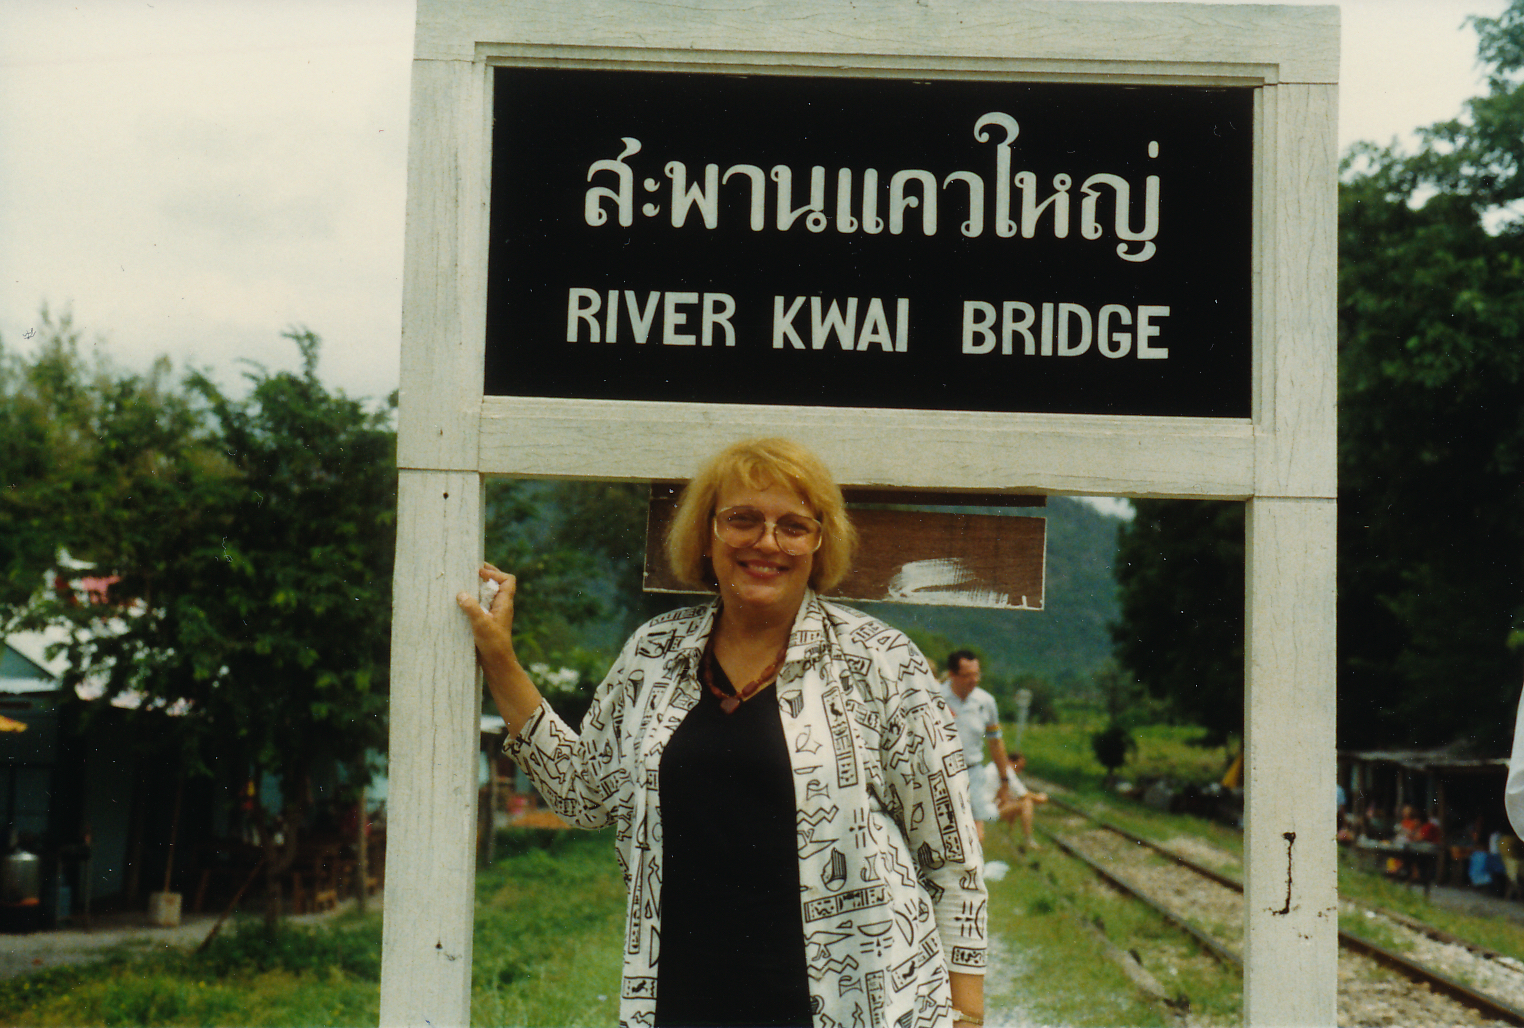 BLS - River Kwai Bridge 1987, Thailand or Japan.jpeg